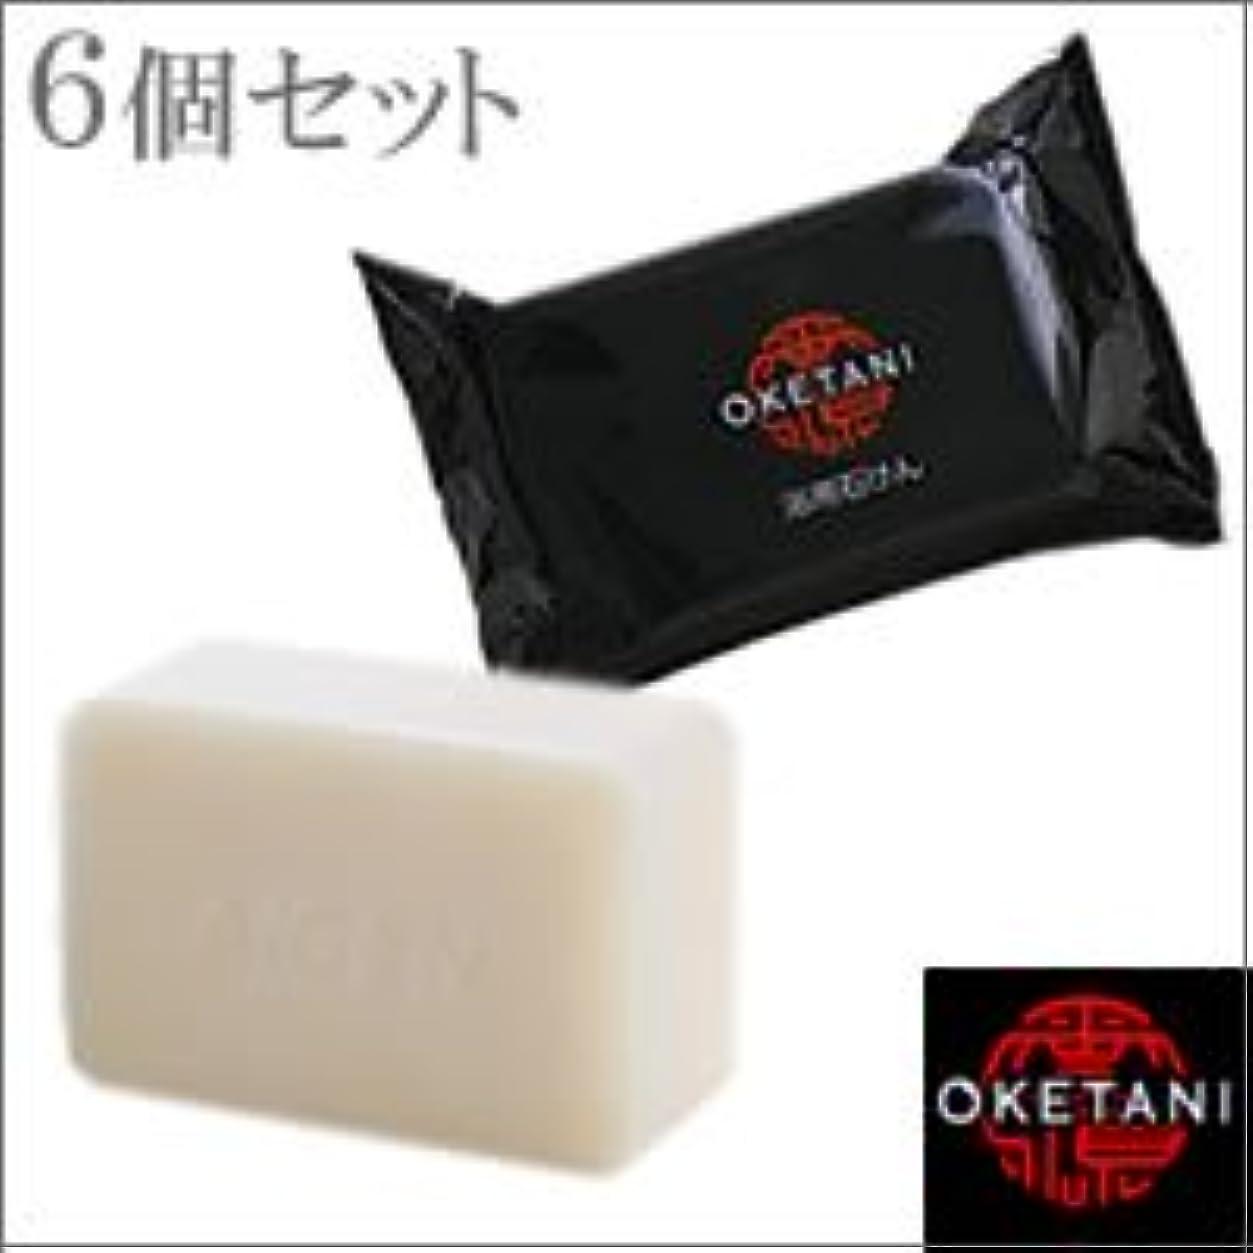 item_name:桶谷石鹸 アイゲン 浴用石けん 120g×6個